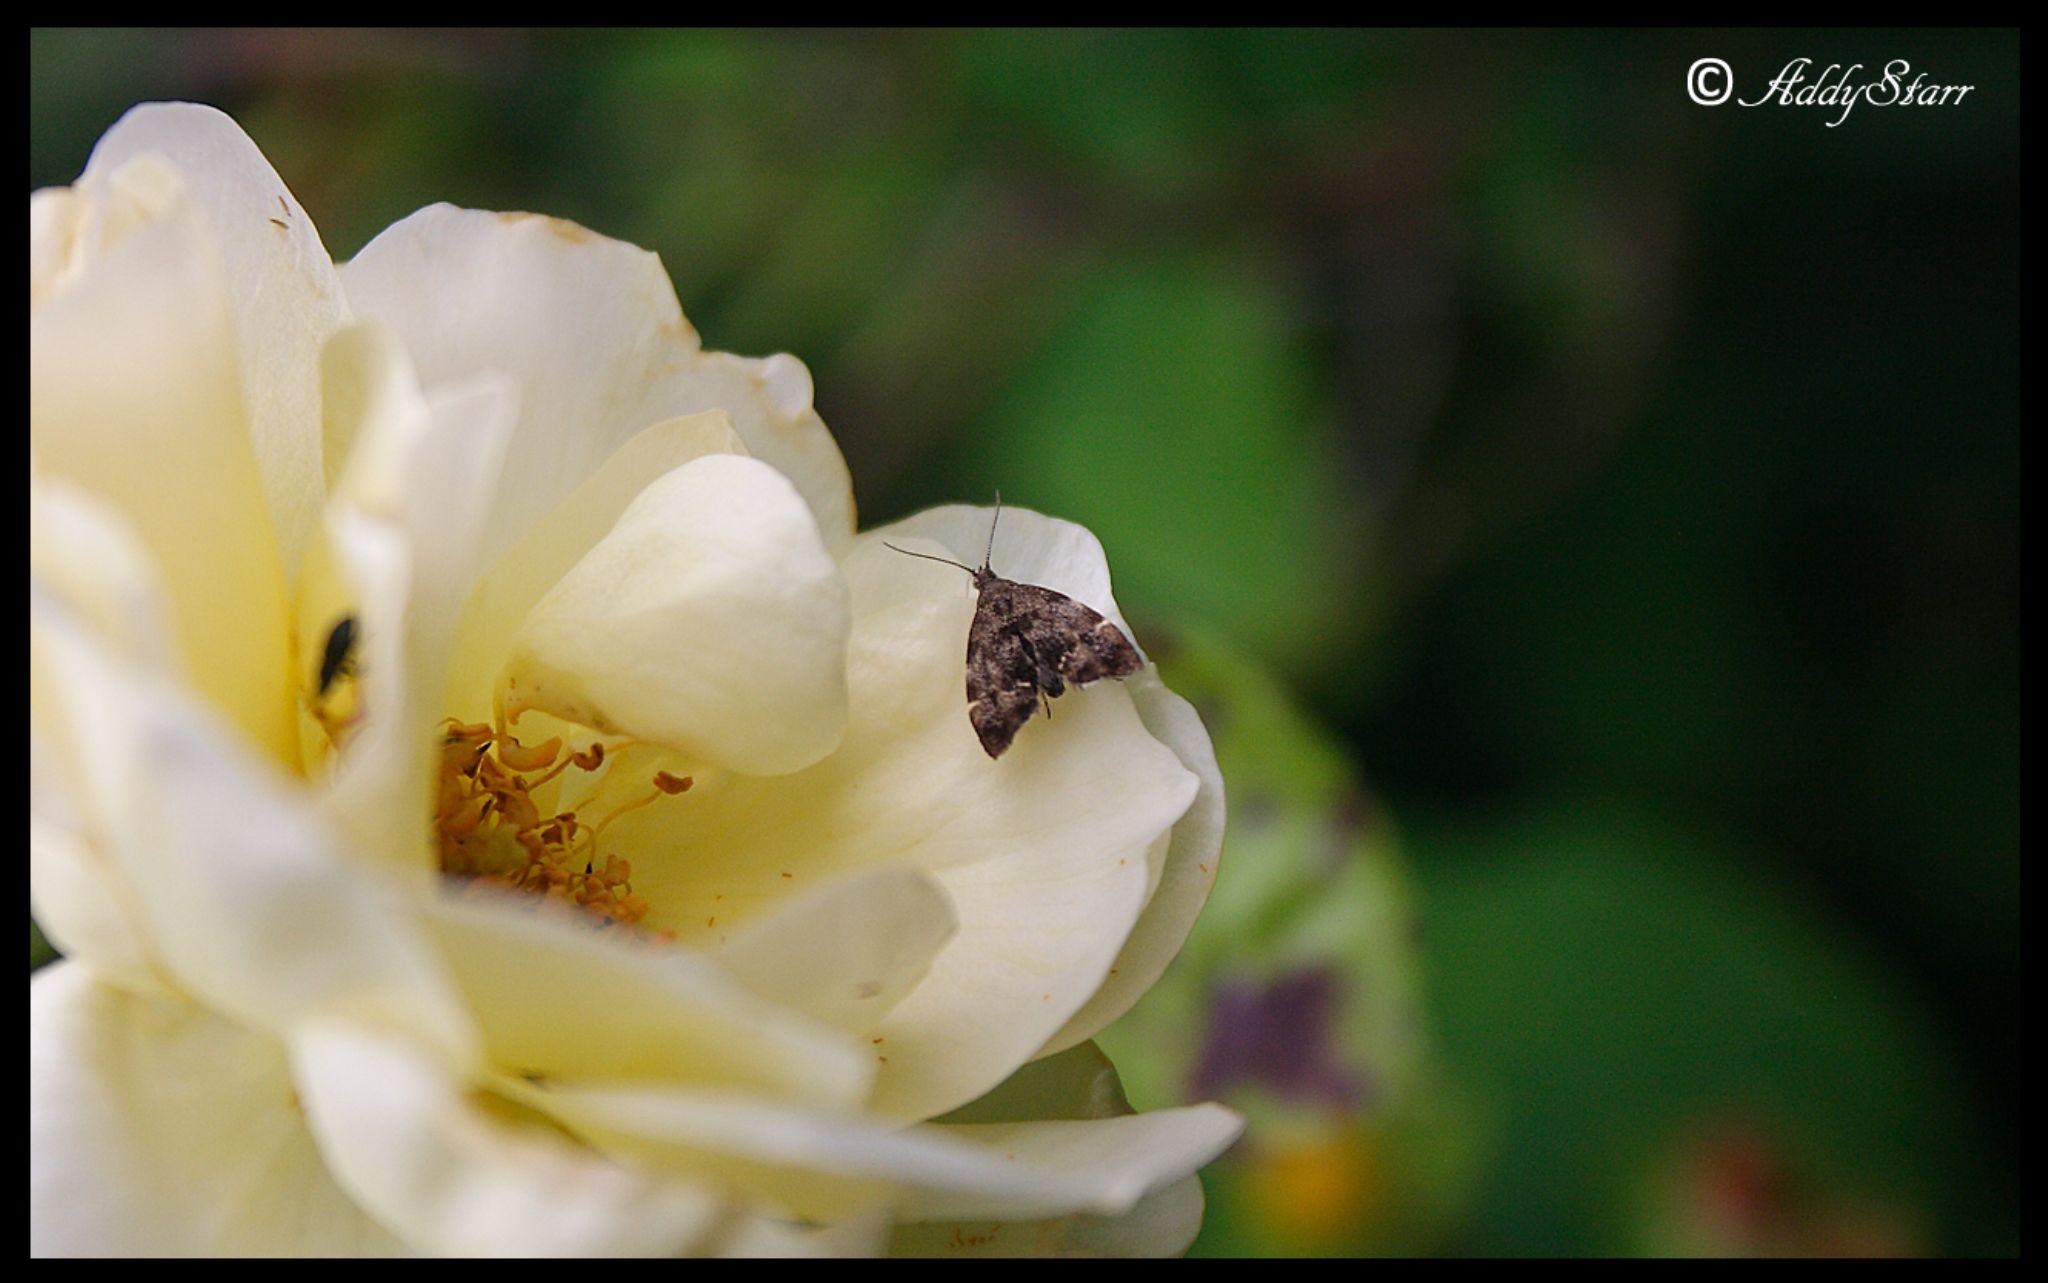 Moth by Addy Starr